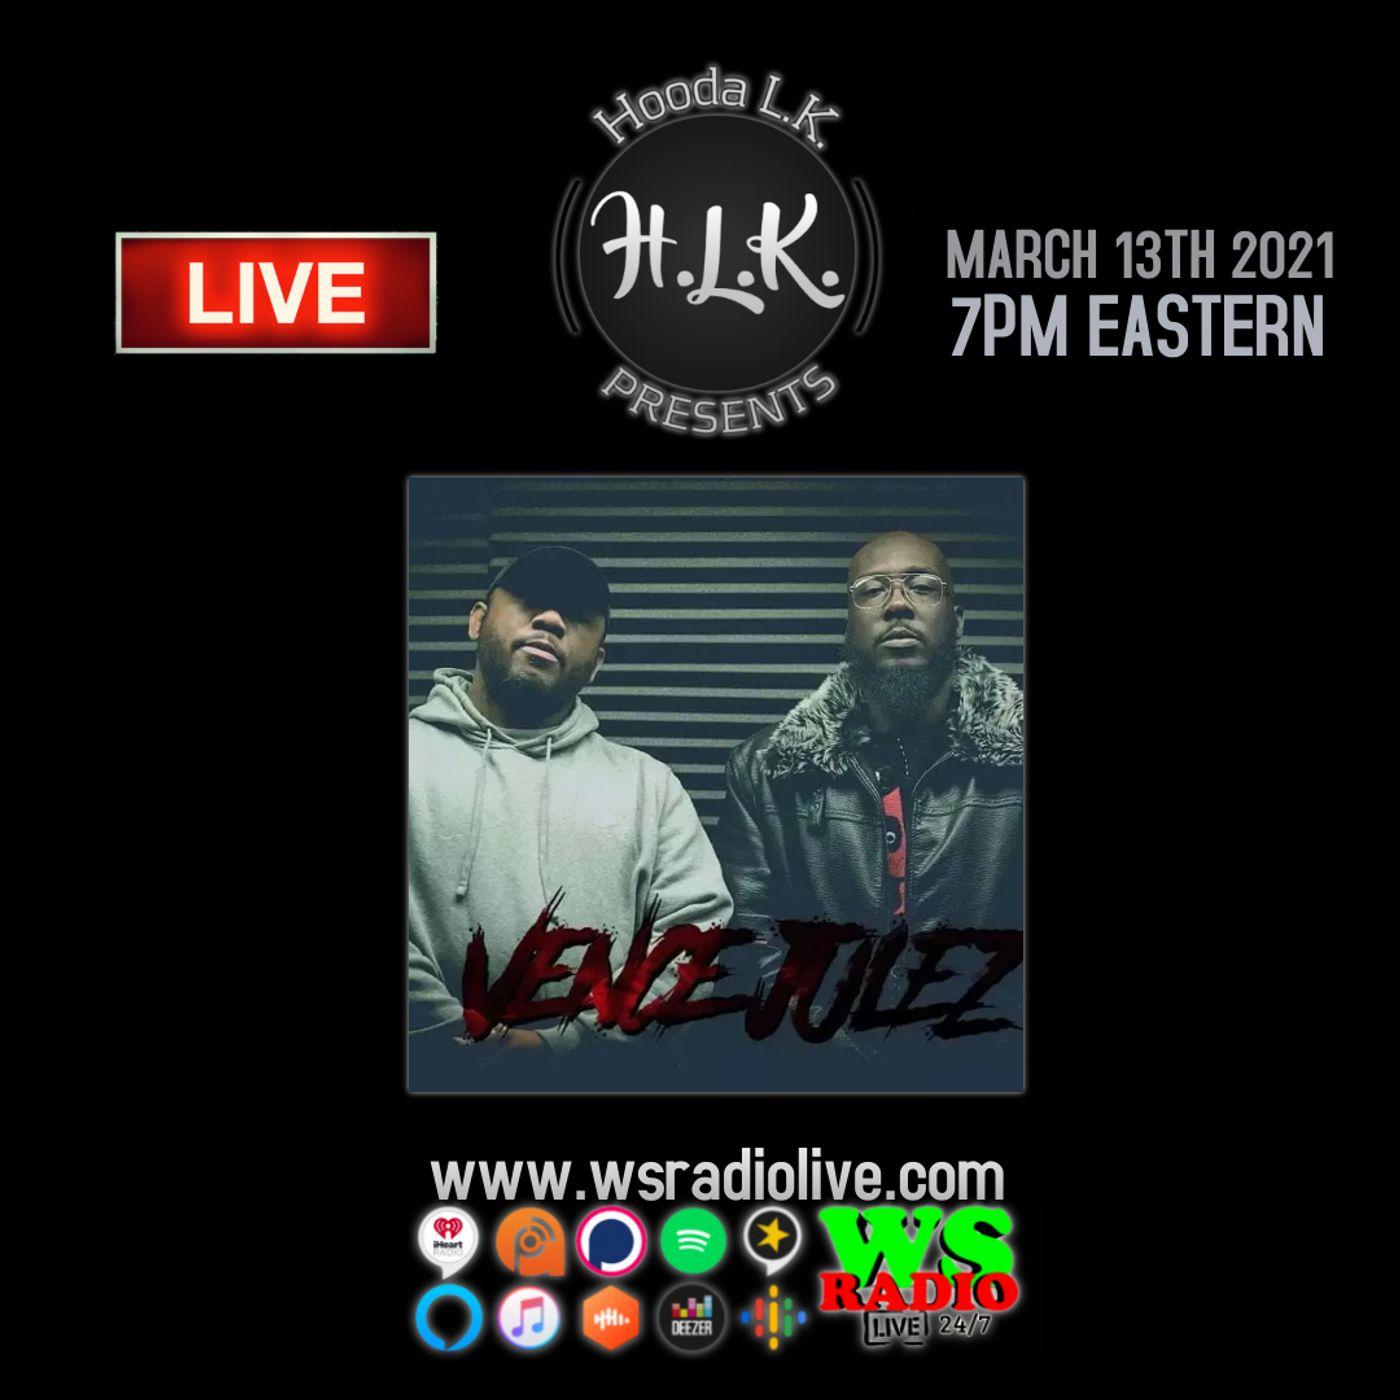 Hooda LK Presents Vence Julez